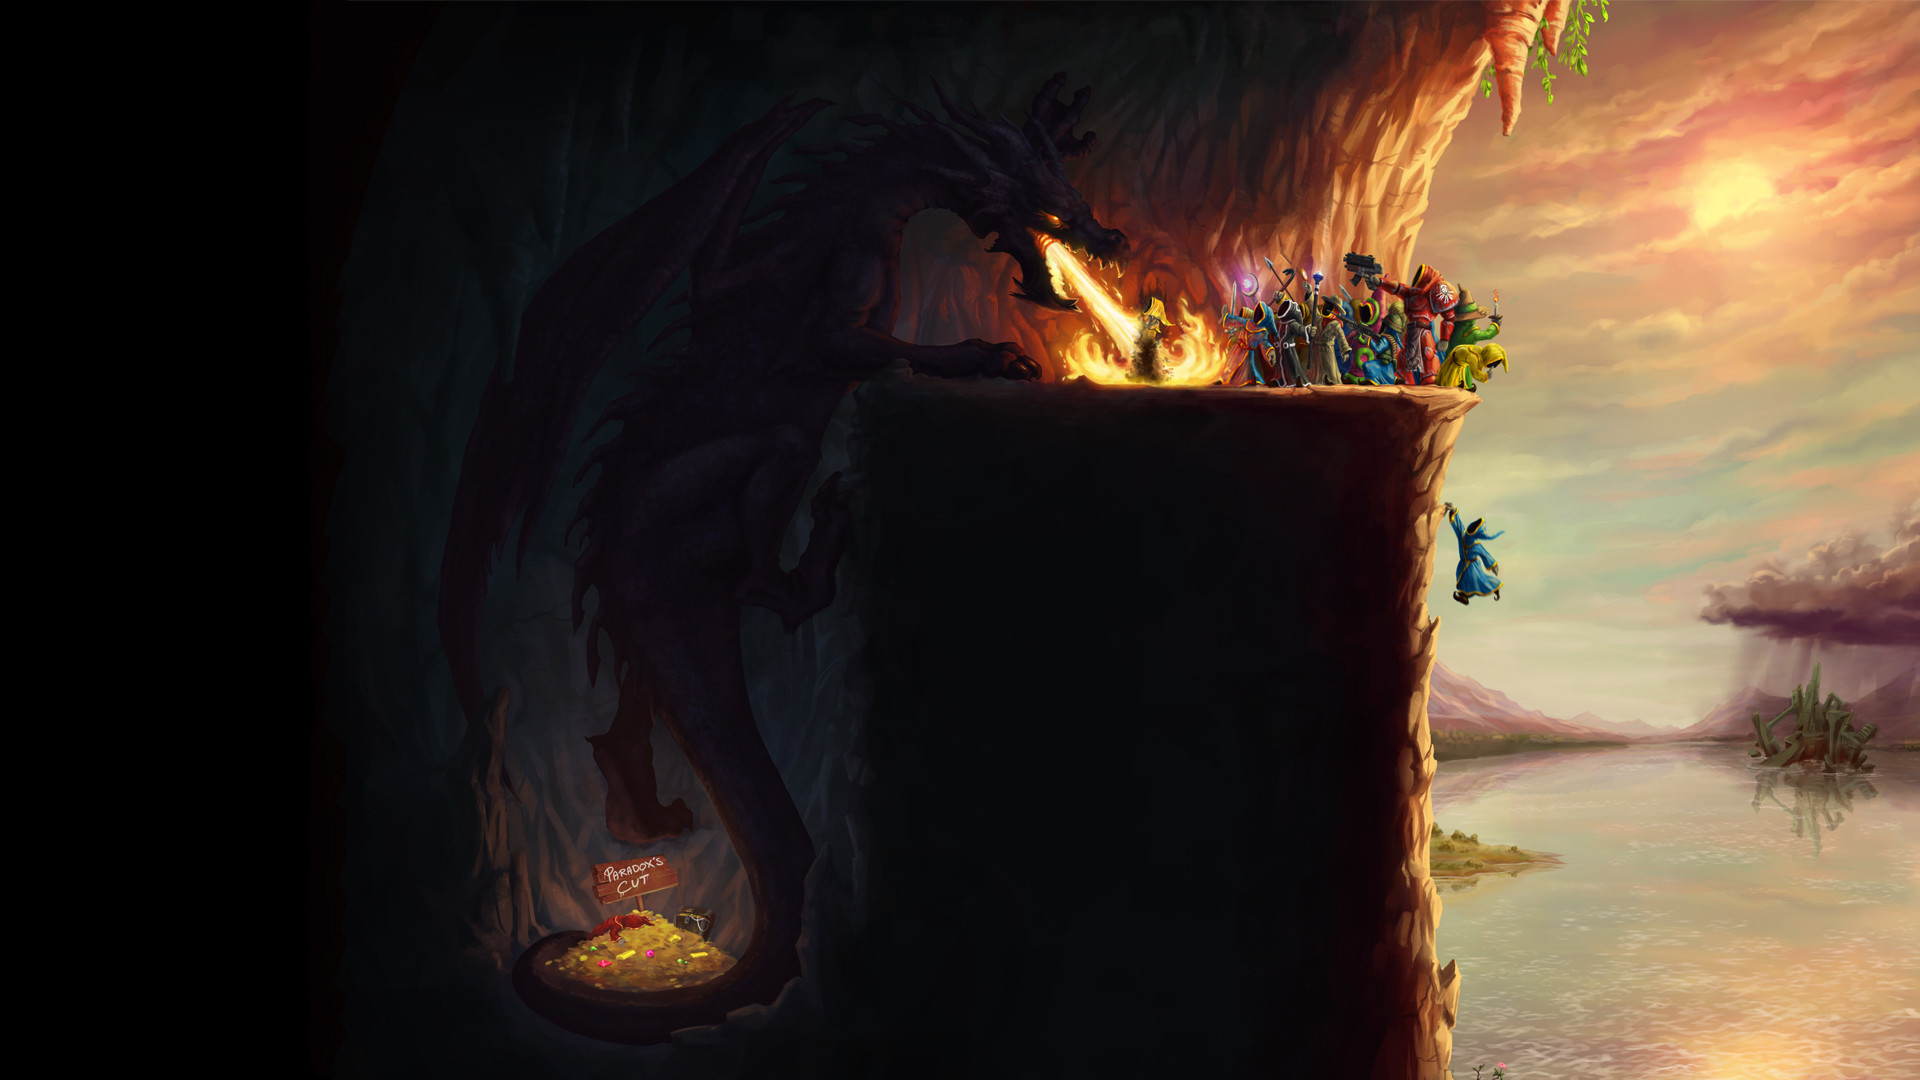 … wallpaper; mage video games wings dragons fire tail artwork magicka …